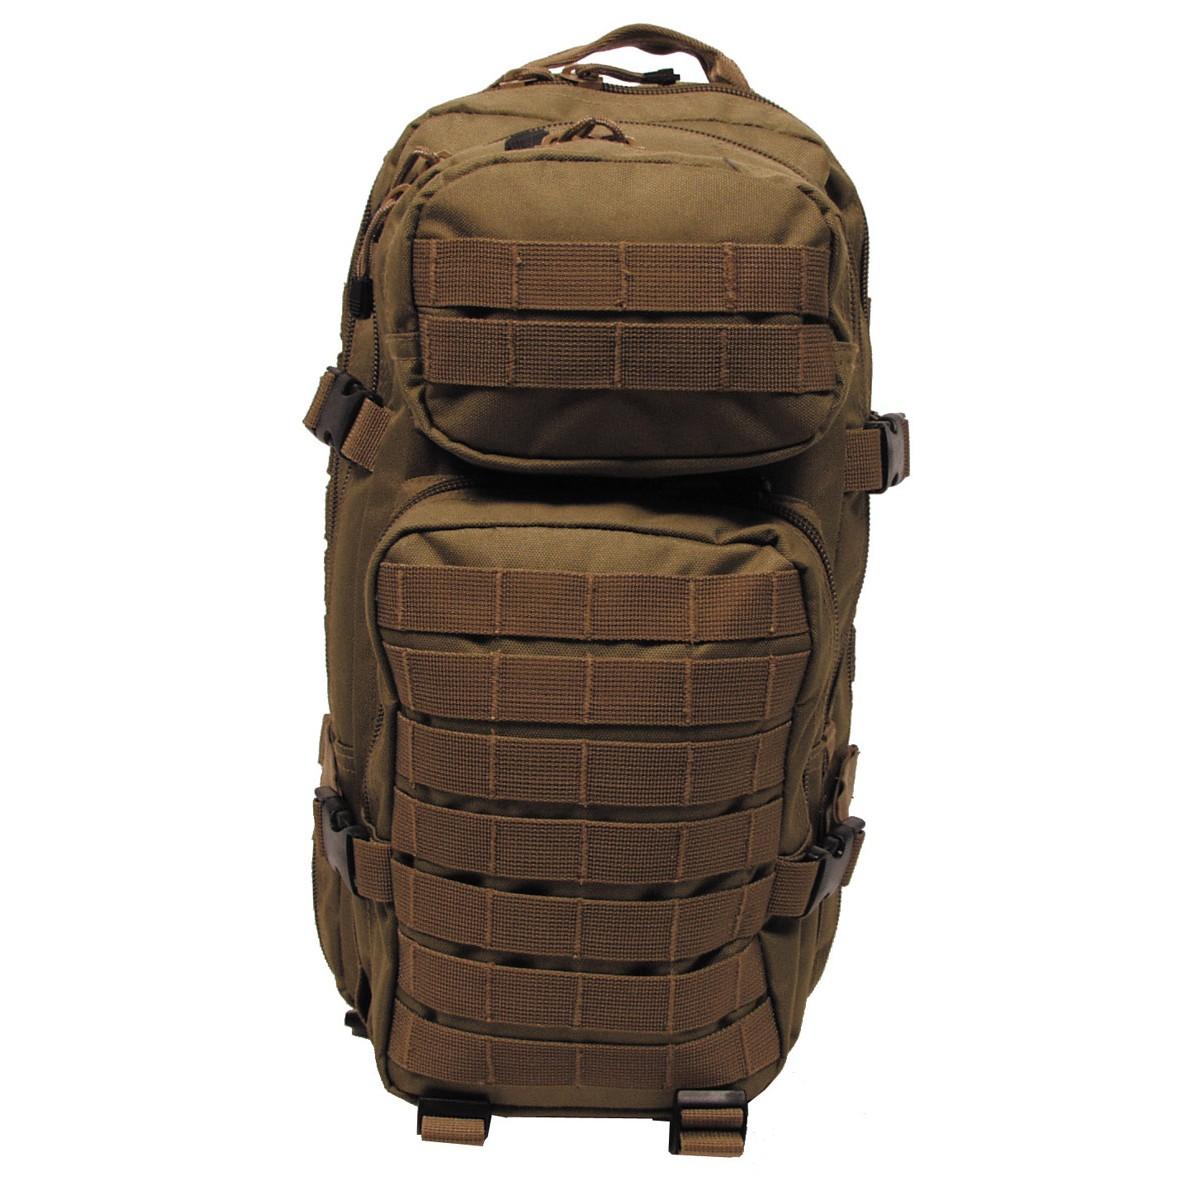 Batoh MFH US Assault S - coyote